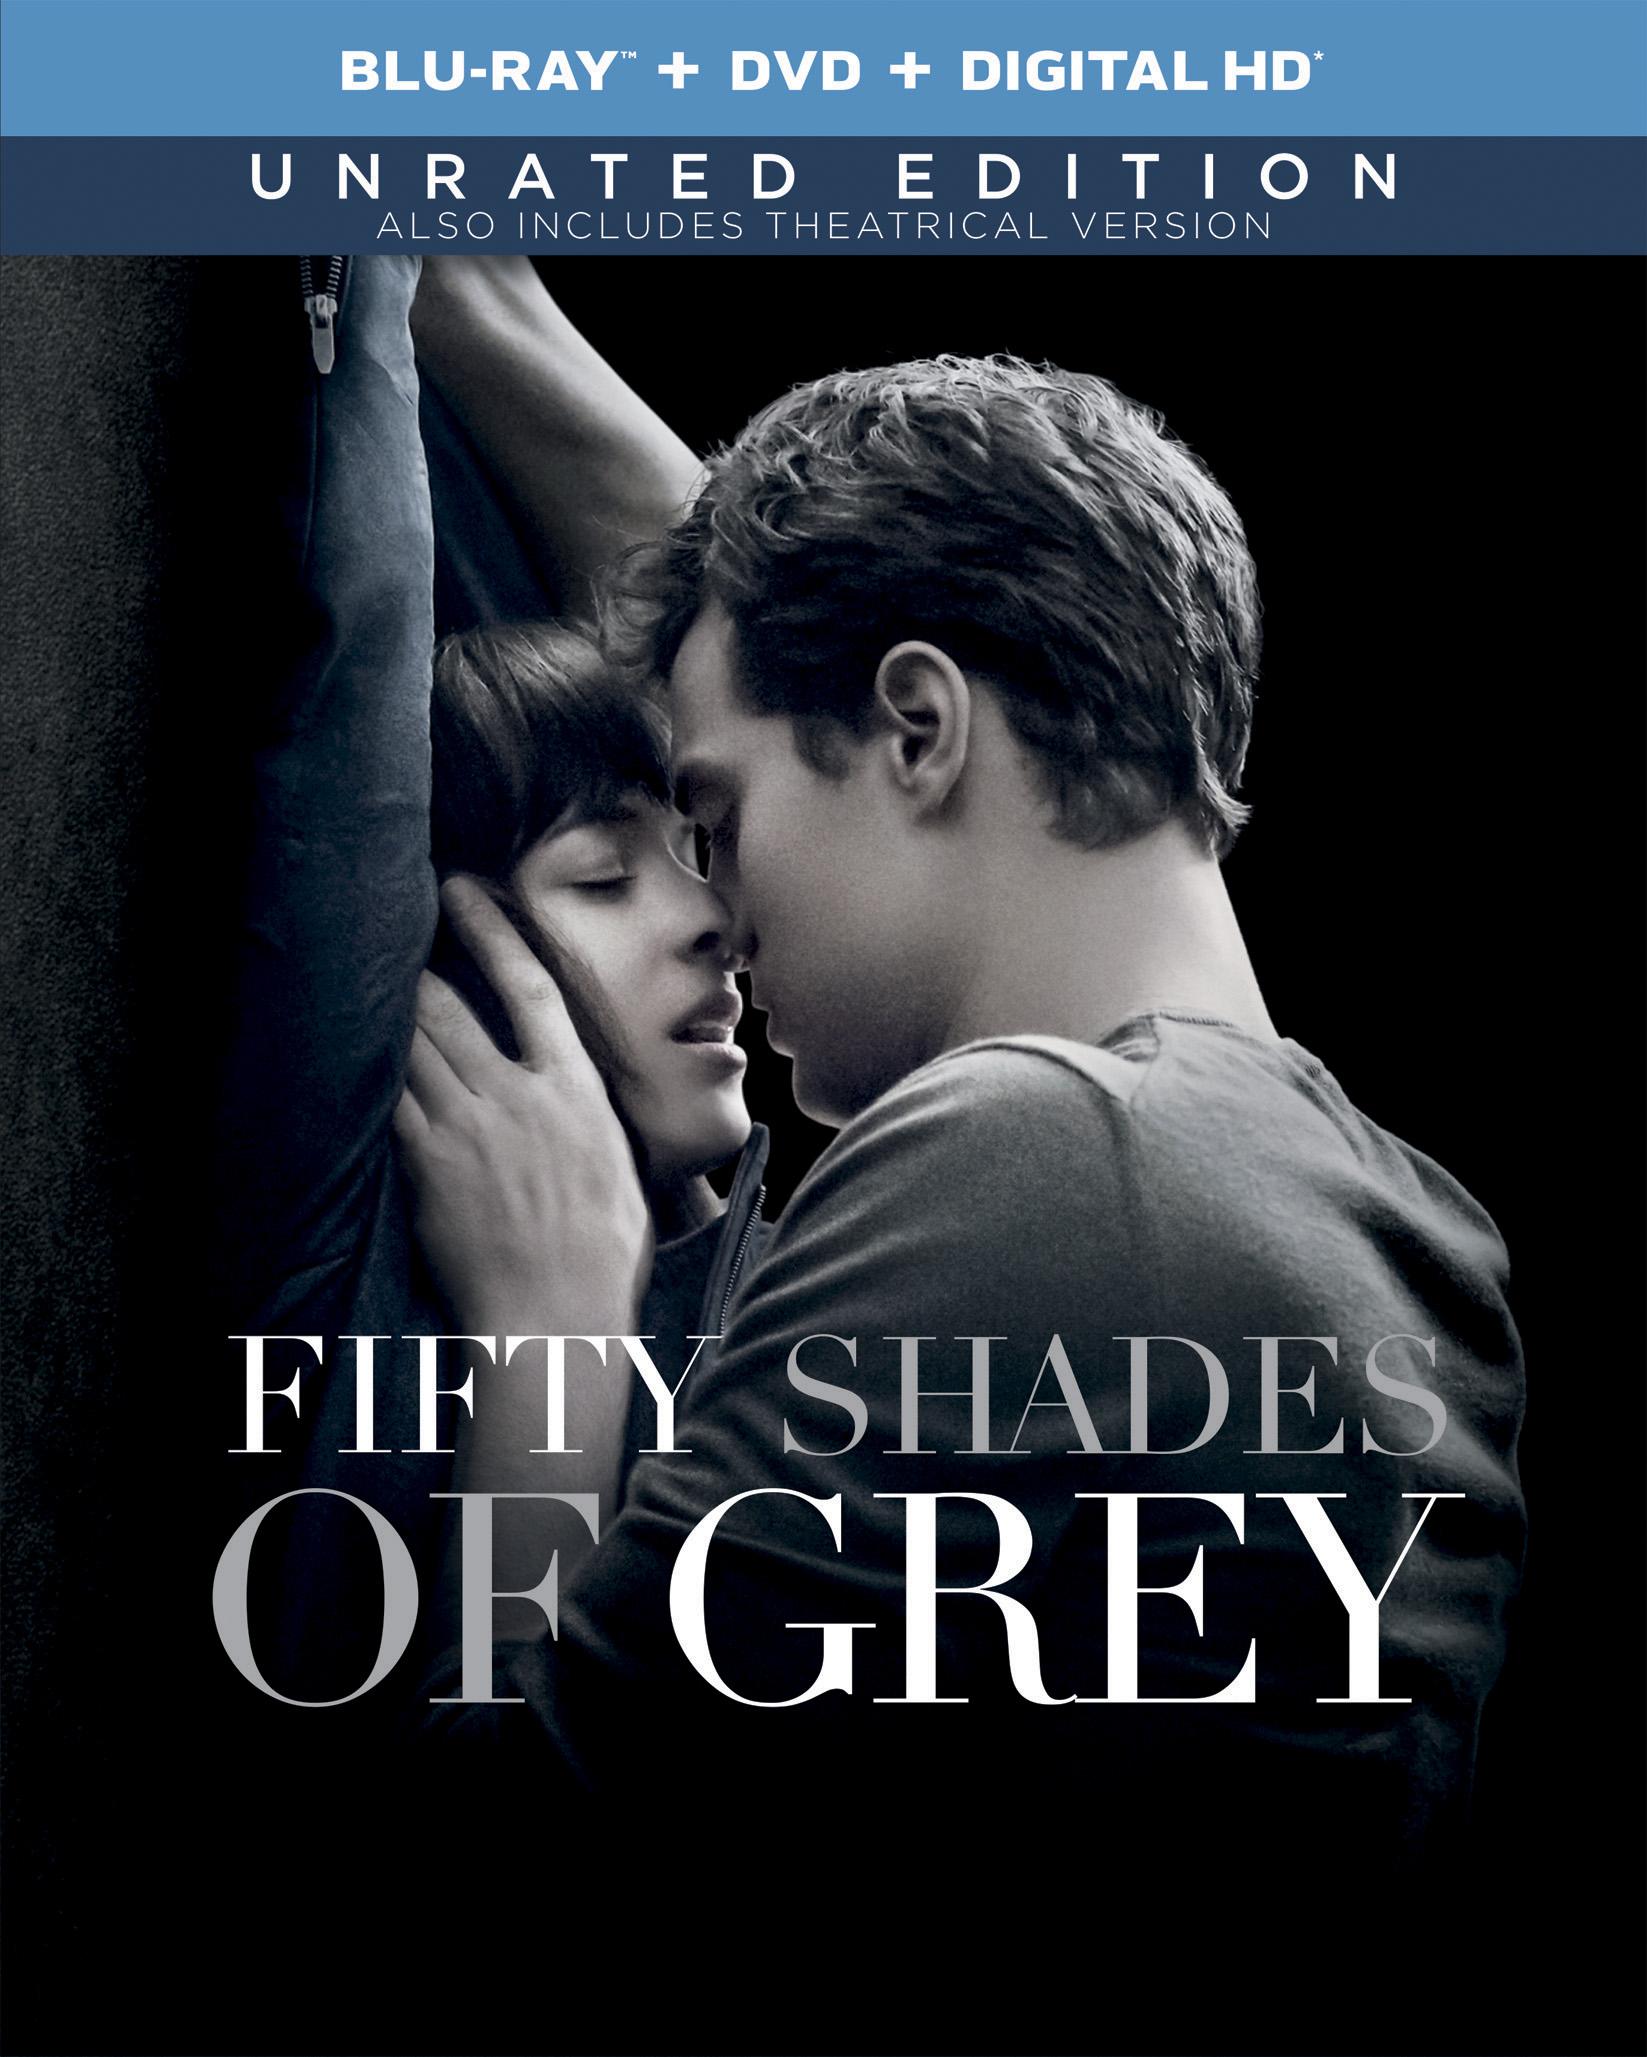 50 Nuances De Grey Integral Film : nuances, integral, Fifty, Shades, Arrives, Blu-ray,, Blackfilm.com, Black, Movies,, Television,, Theatre